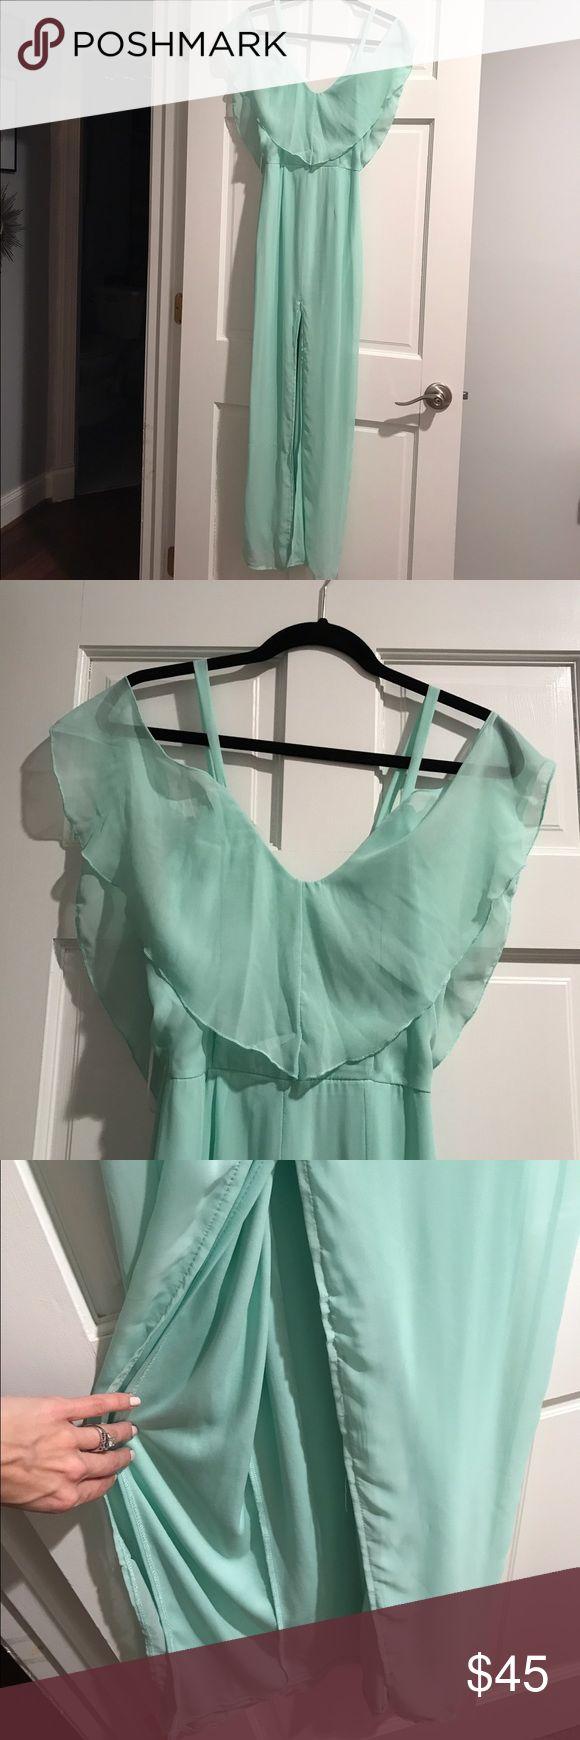 Selling this ASOS Mint Green Maxi Dress with Slit Size 2 on Poshmark! My username is: ashleyfranc2. #shopmycloset #poshmark #fashion #shopping #style #forsale #ASOS #Dresses & Skirts